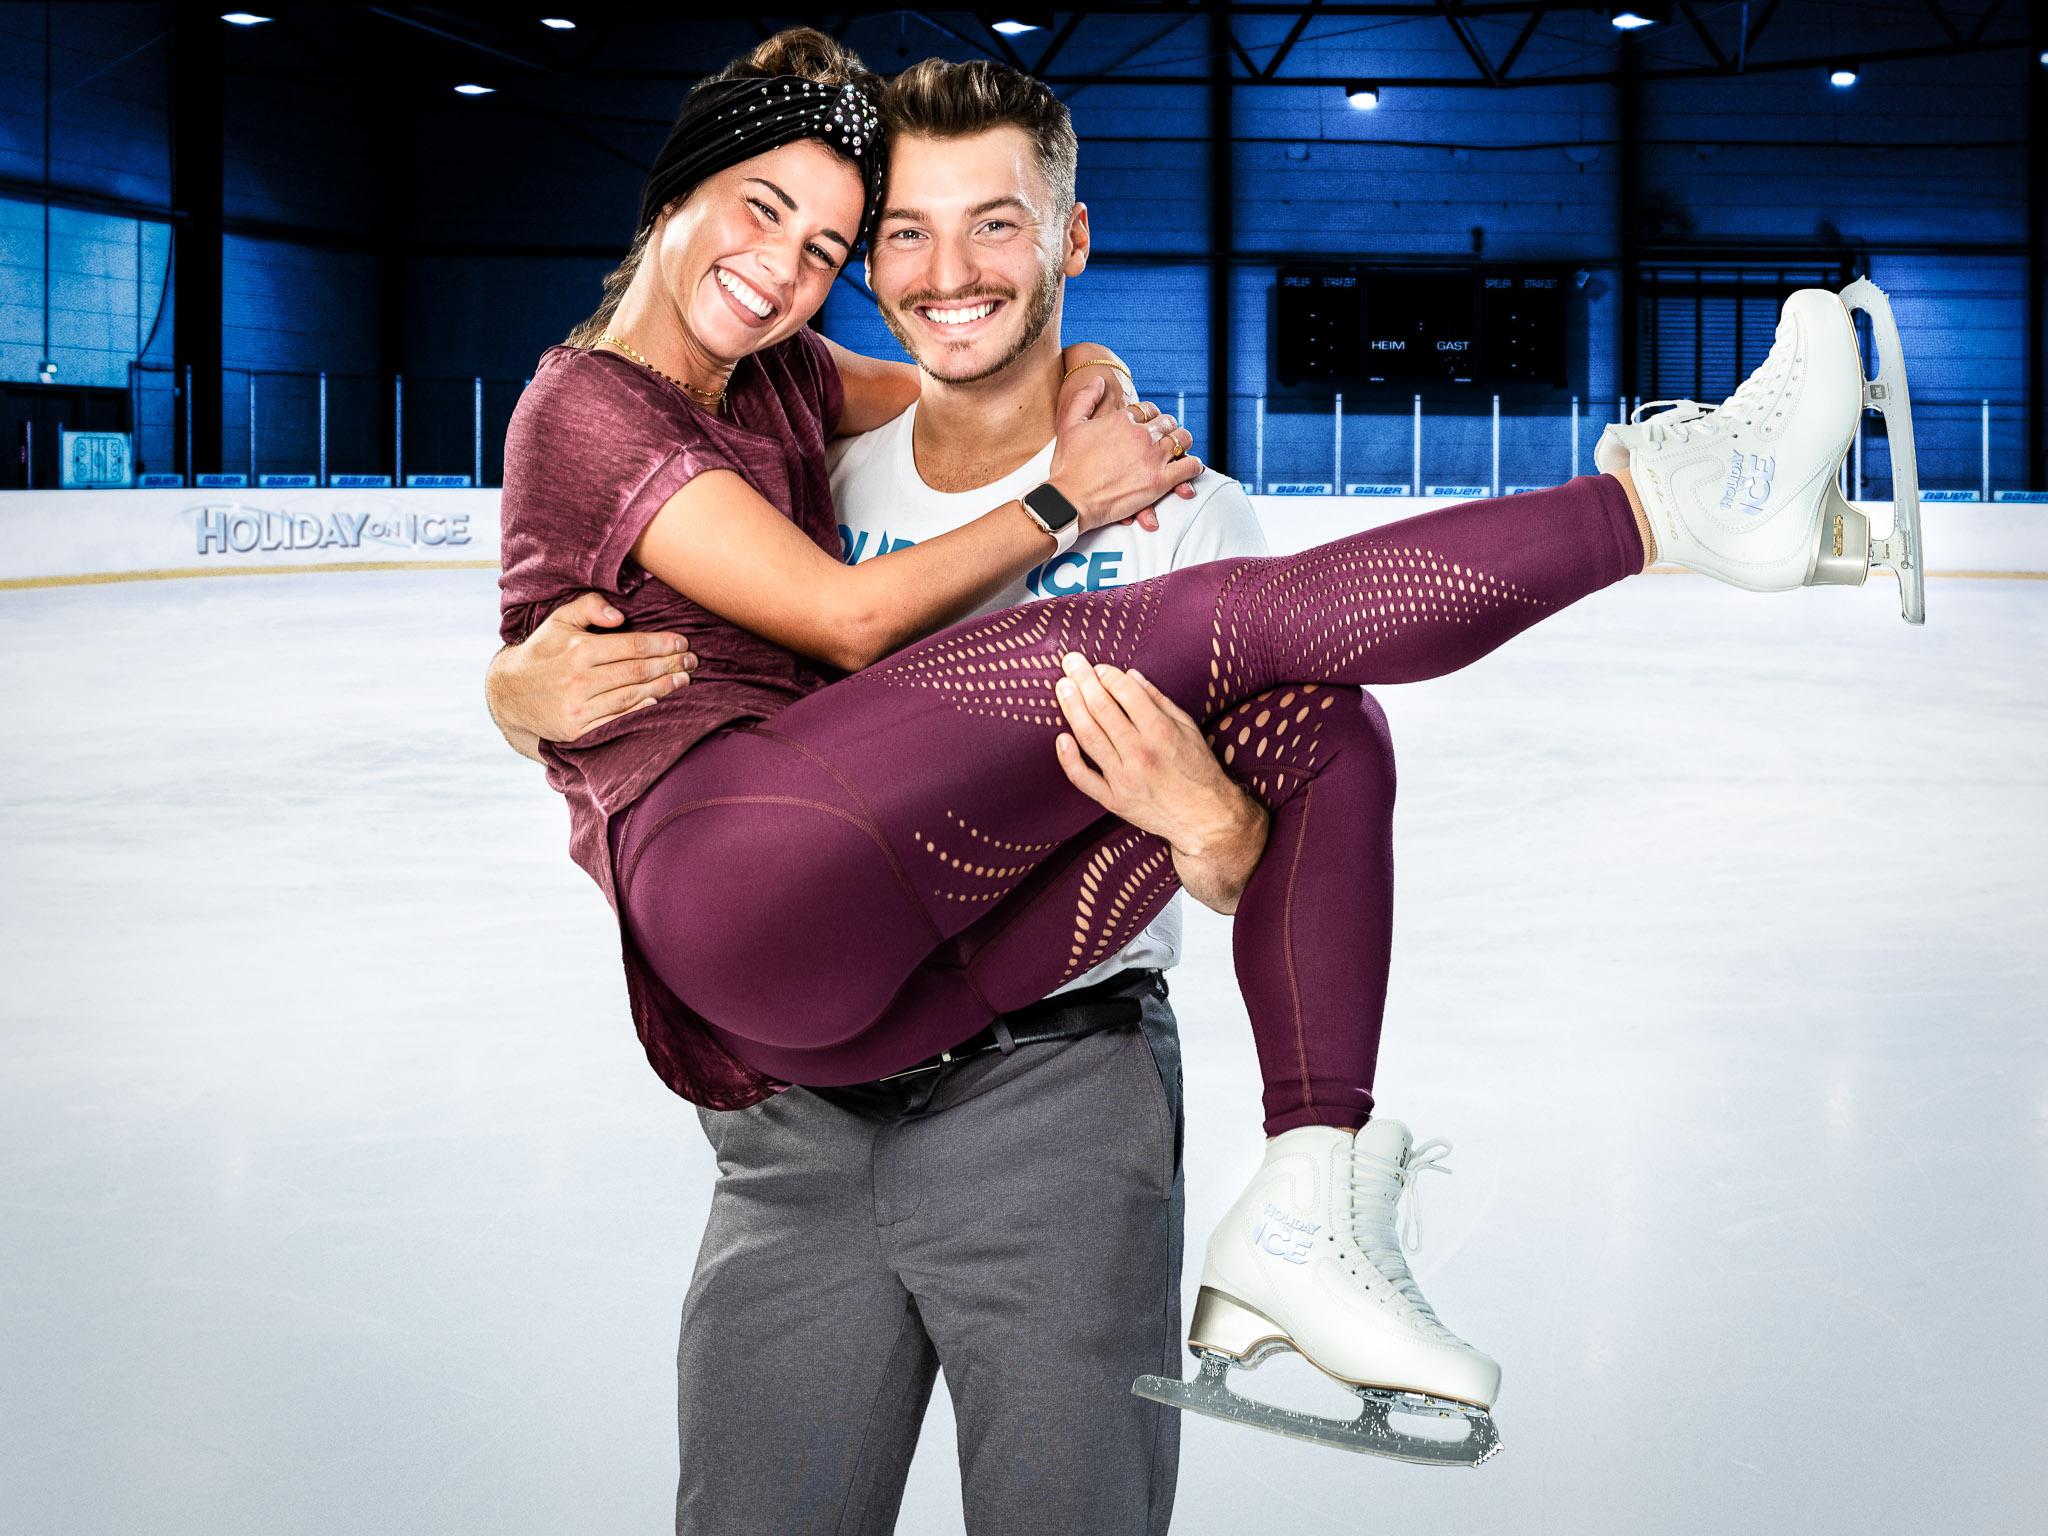 Joti Polizoakis ist Sarah Lombardis Eislaufpartner bei HOLIDAY ON ICE